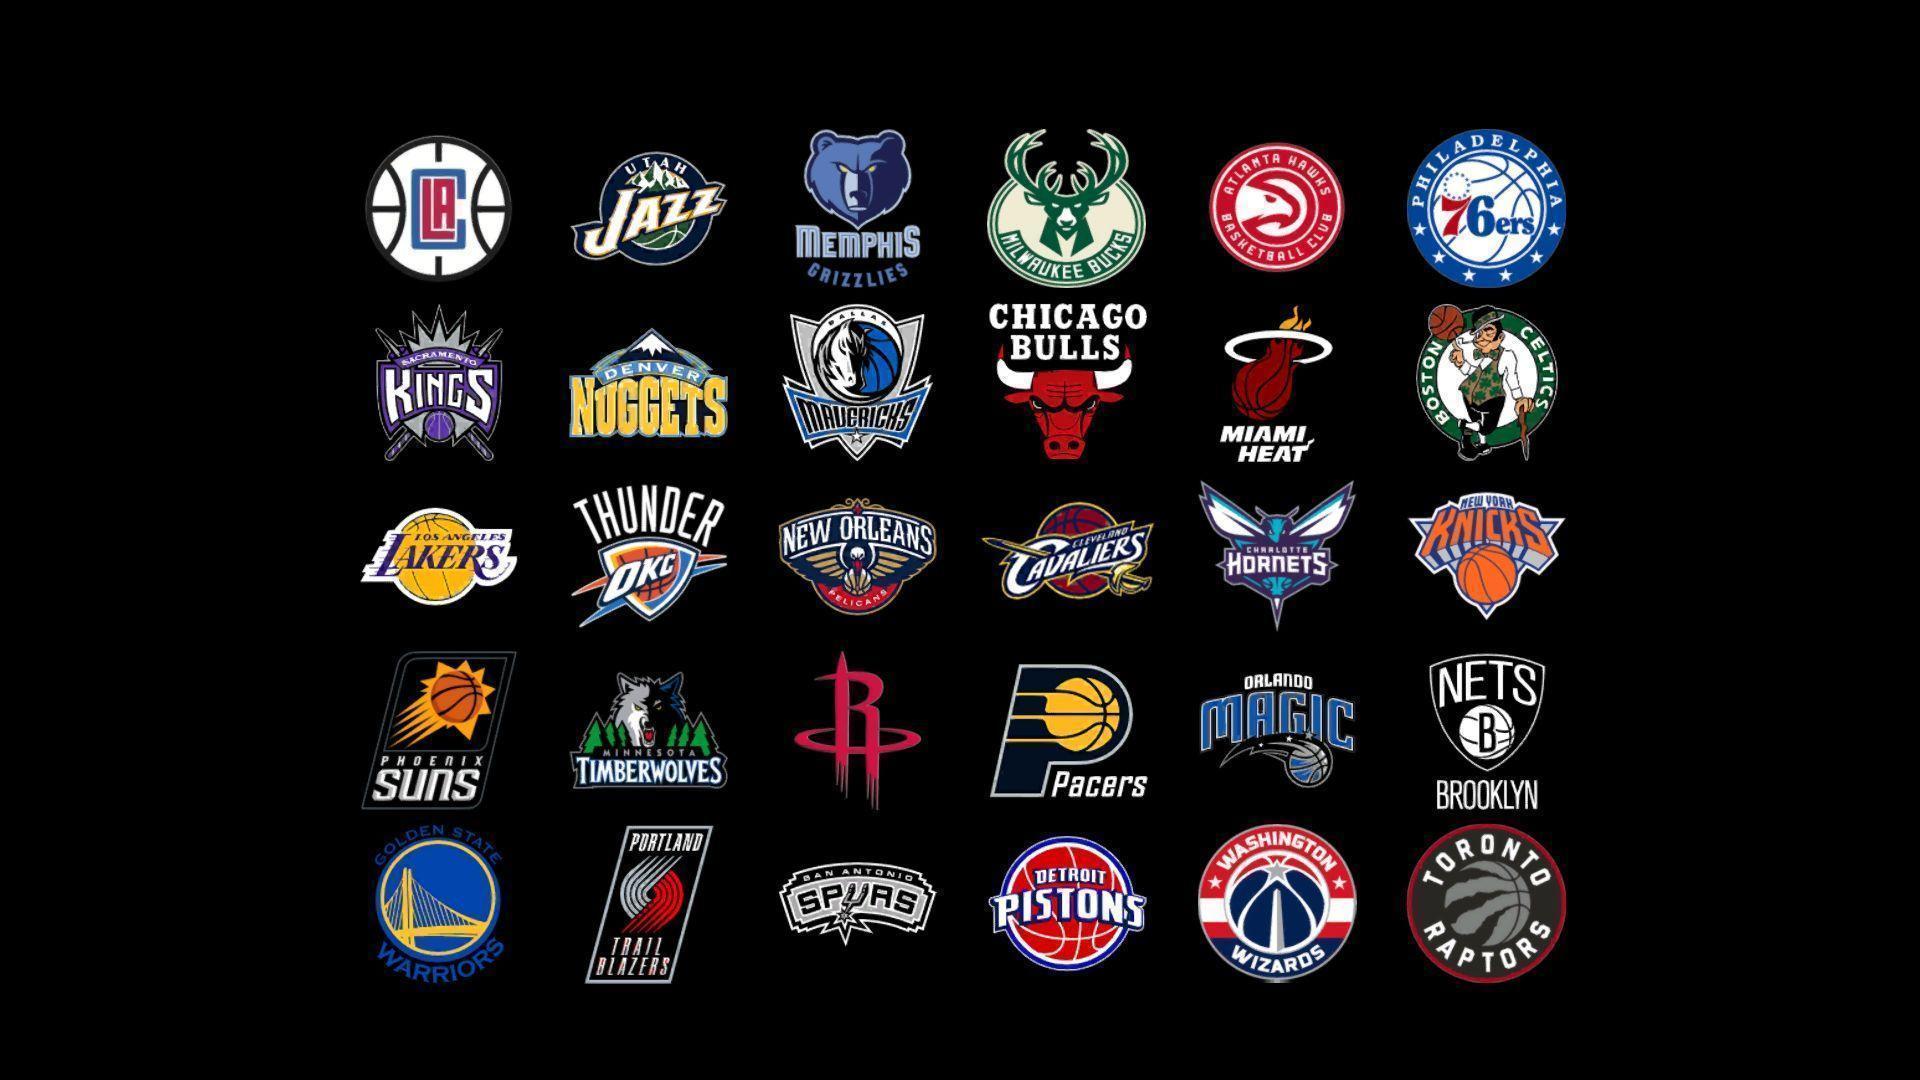 Nba Team Logos Wallpapers Top Free Nba Team Logos Backgrounds Wallpaperaccess